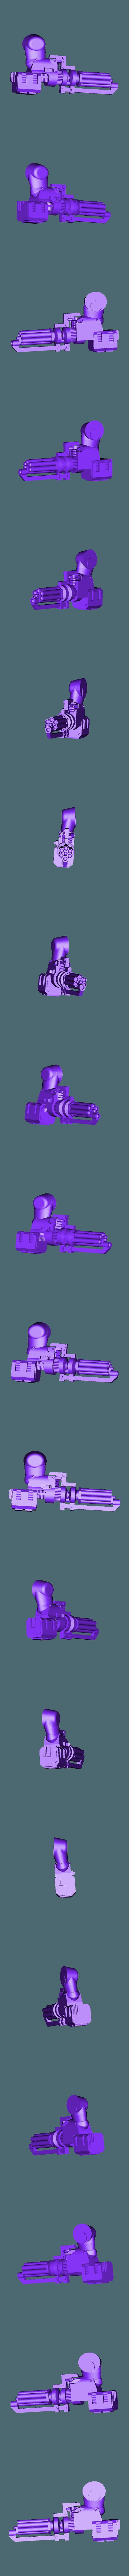 Assault_Cannon.stl Download free STL file Cronusine Pattern Terminator Builder • 3D printing template, HappyDuck3D